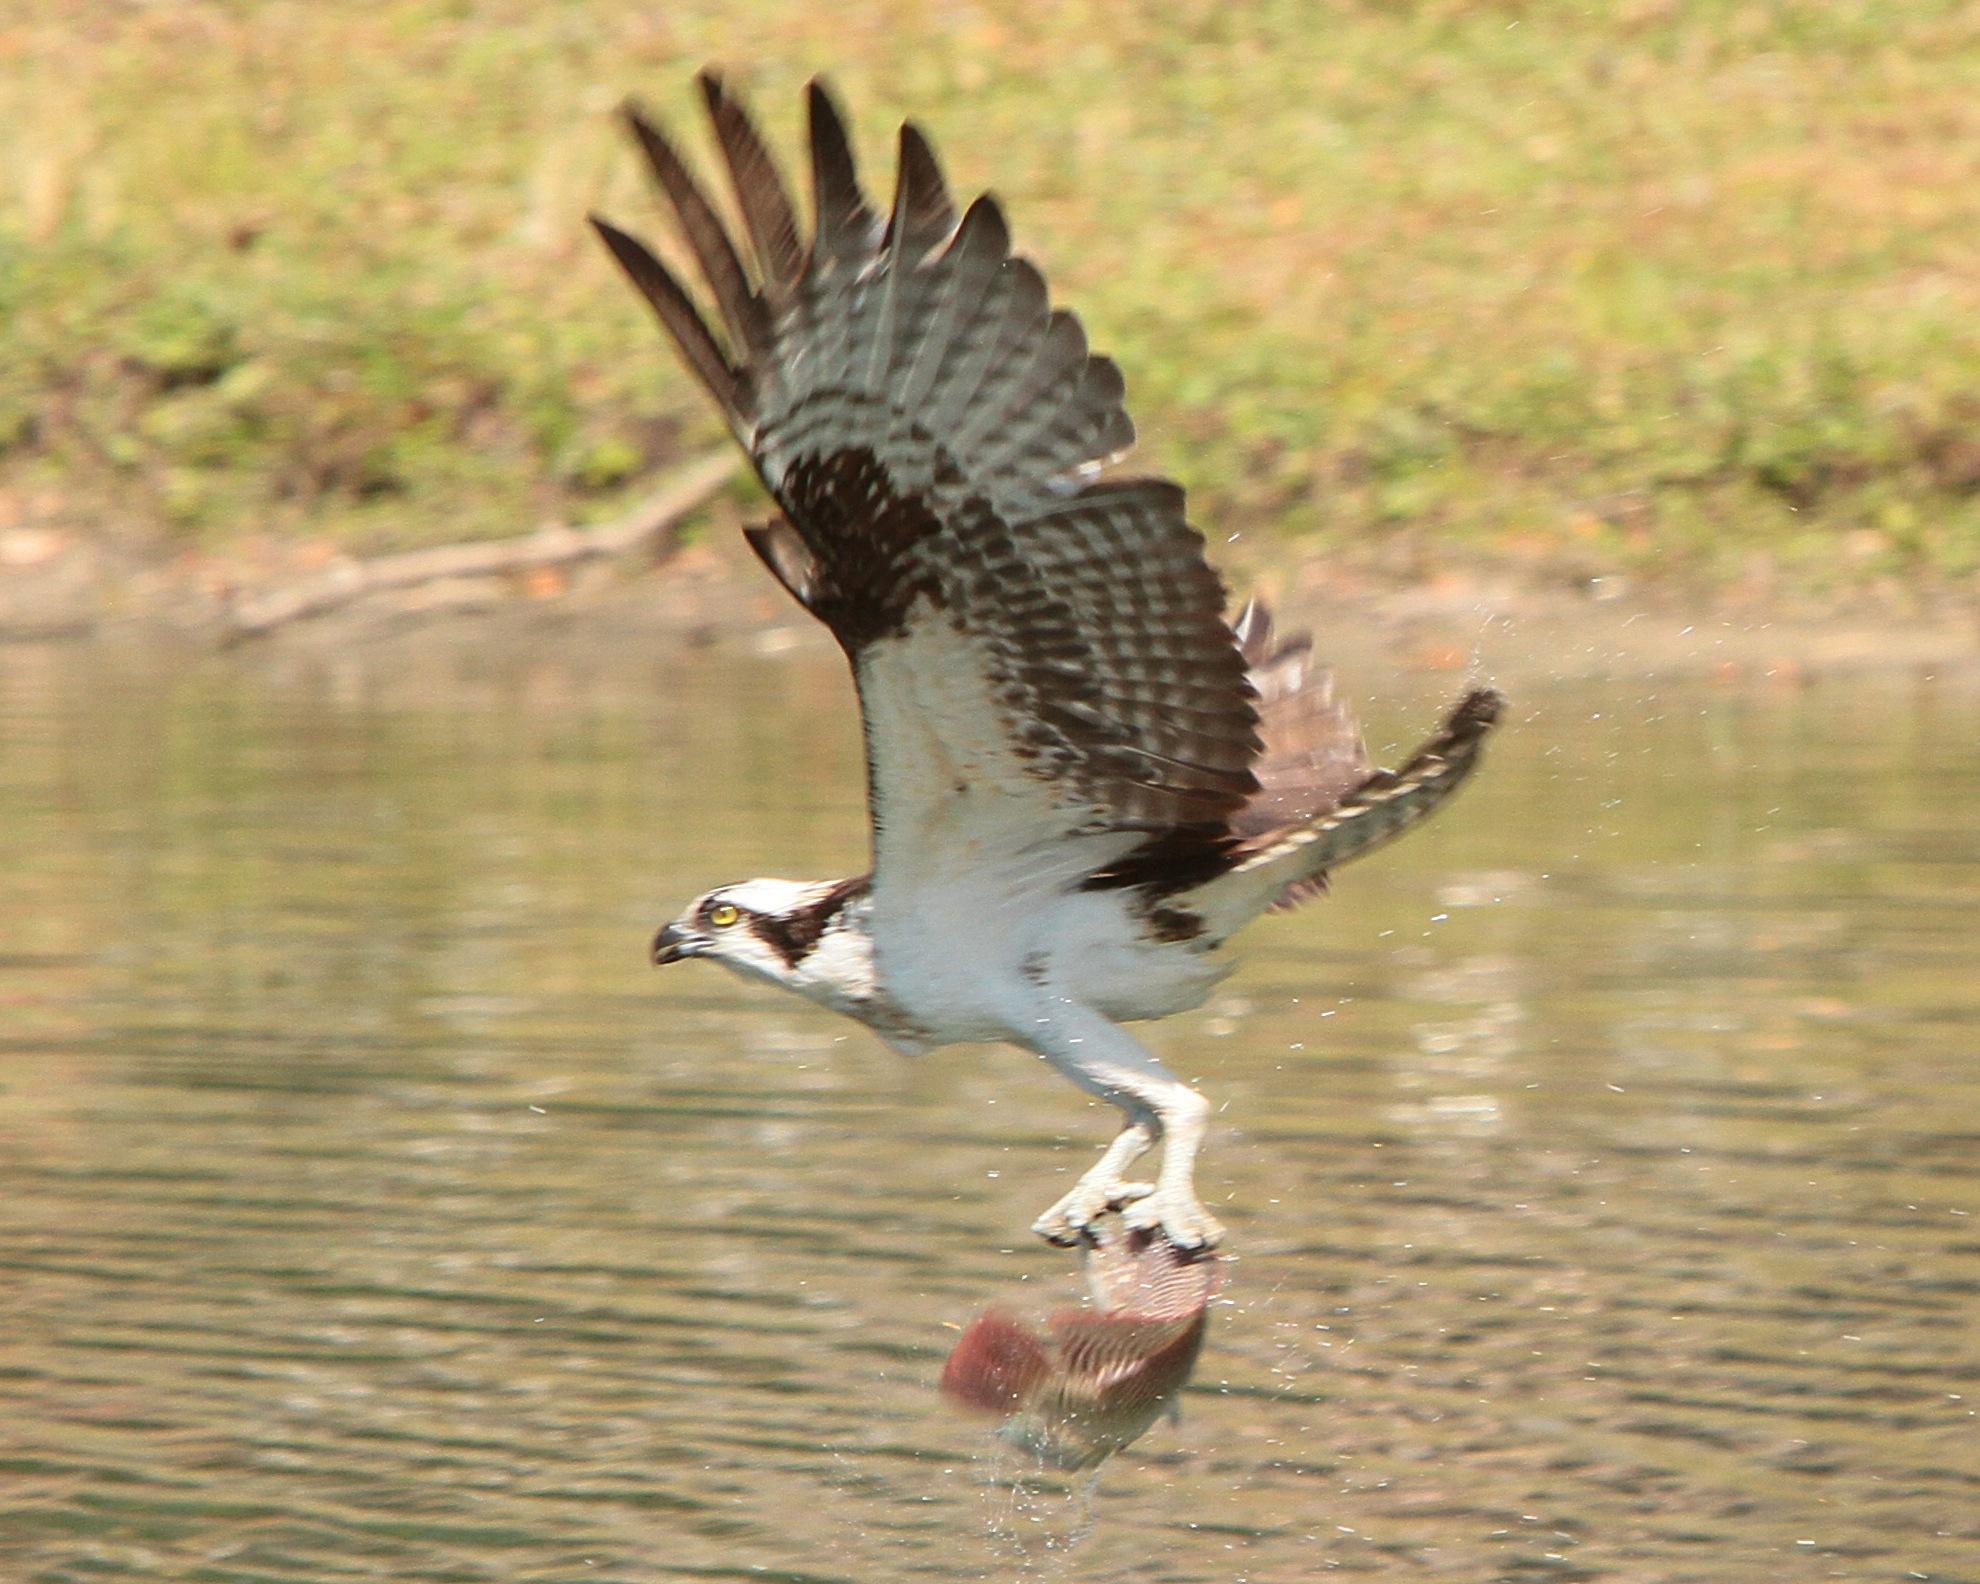 Launching into flight by Dan Ross